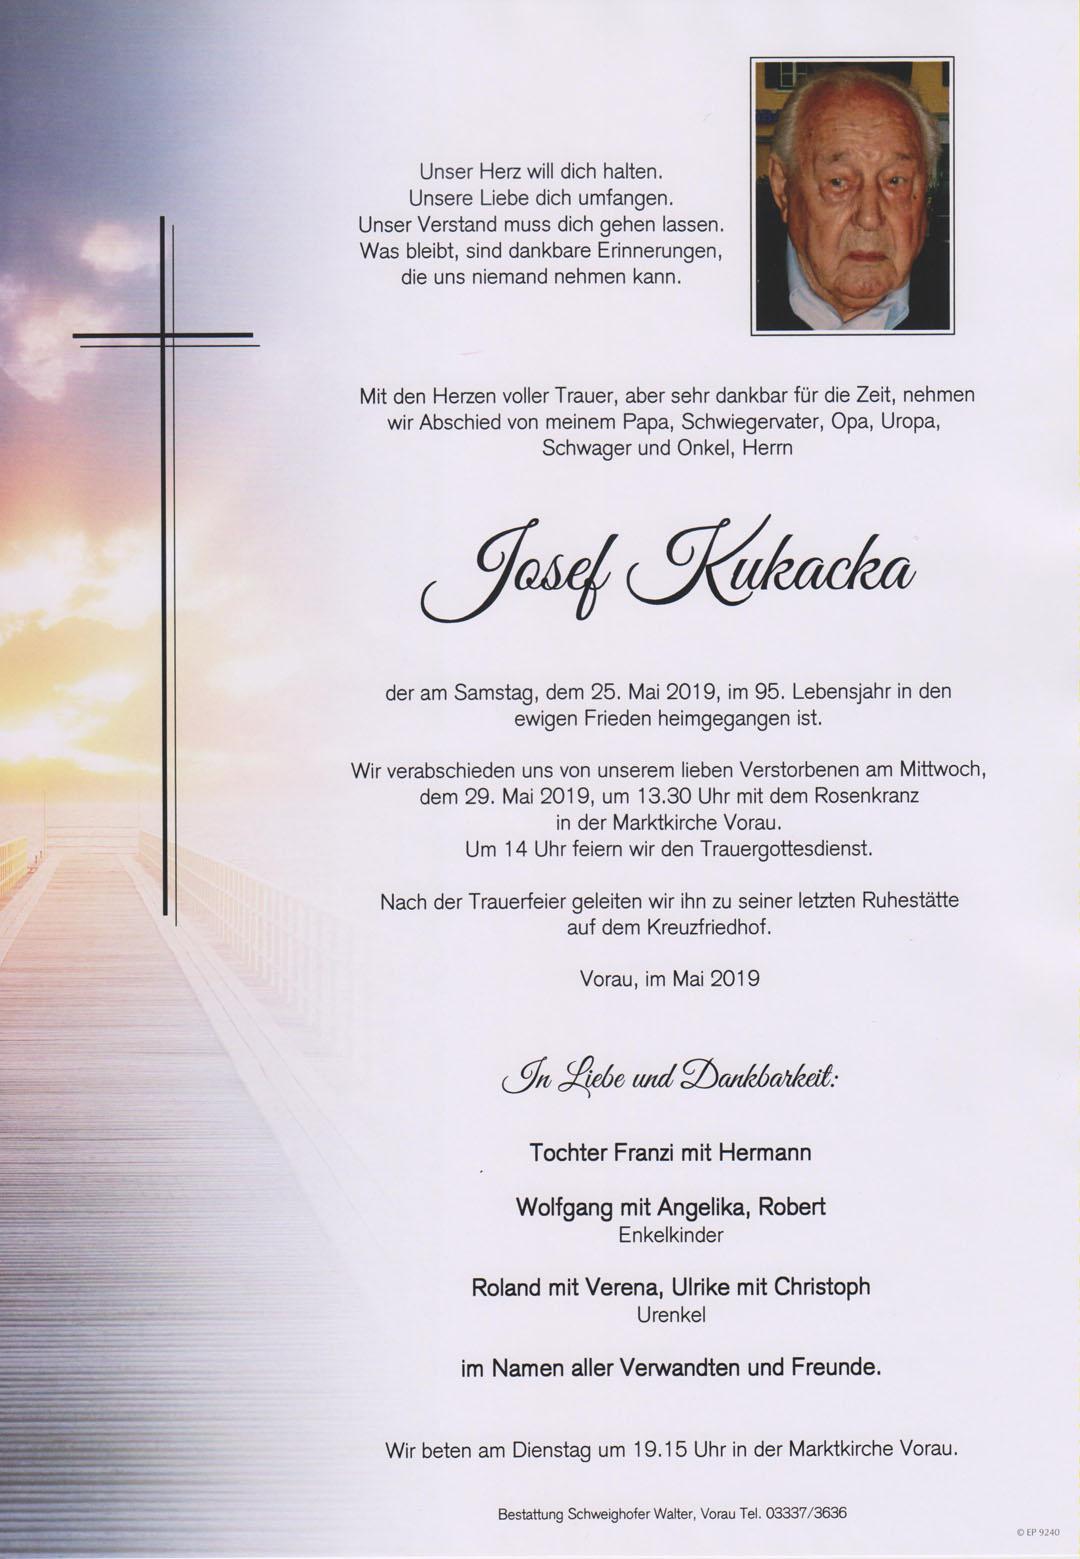 Josef Kukacka